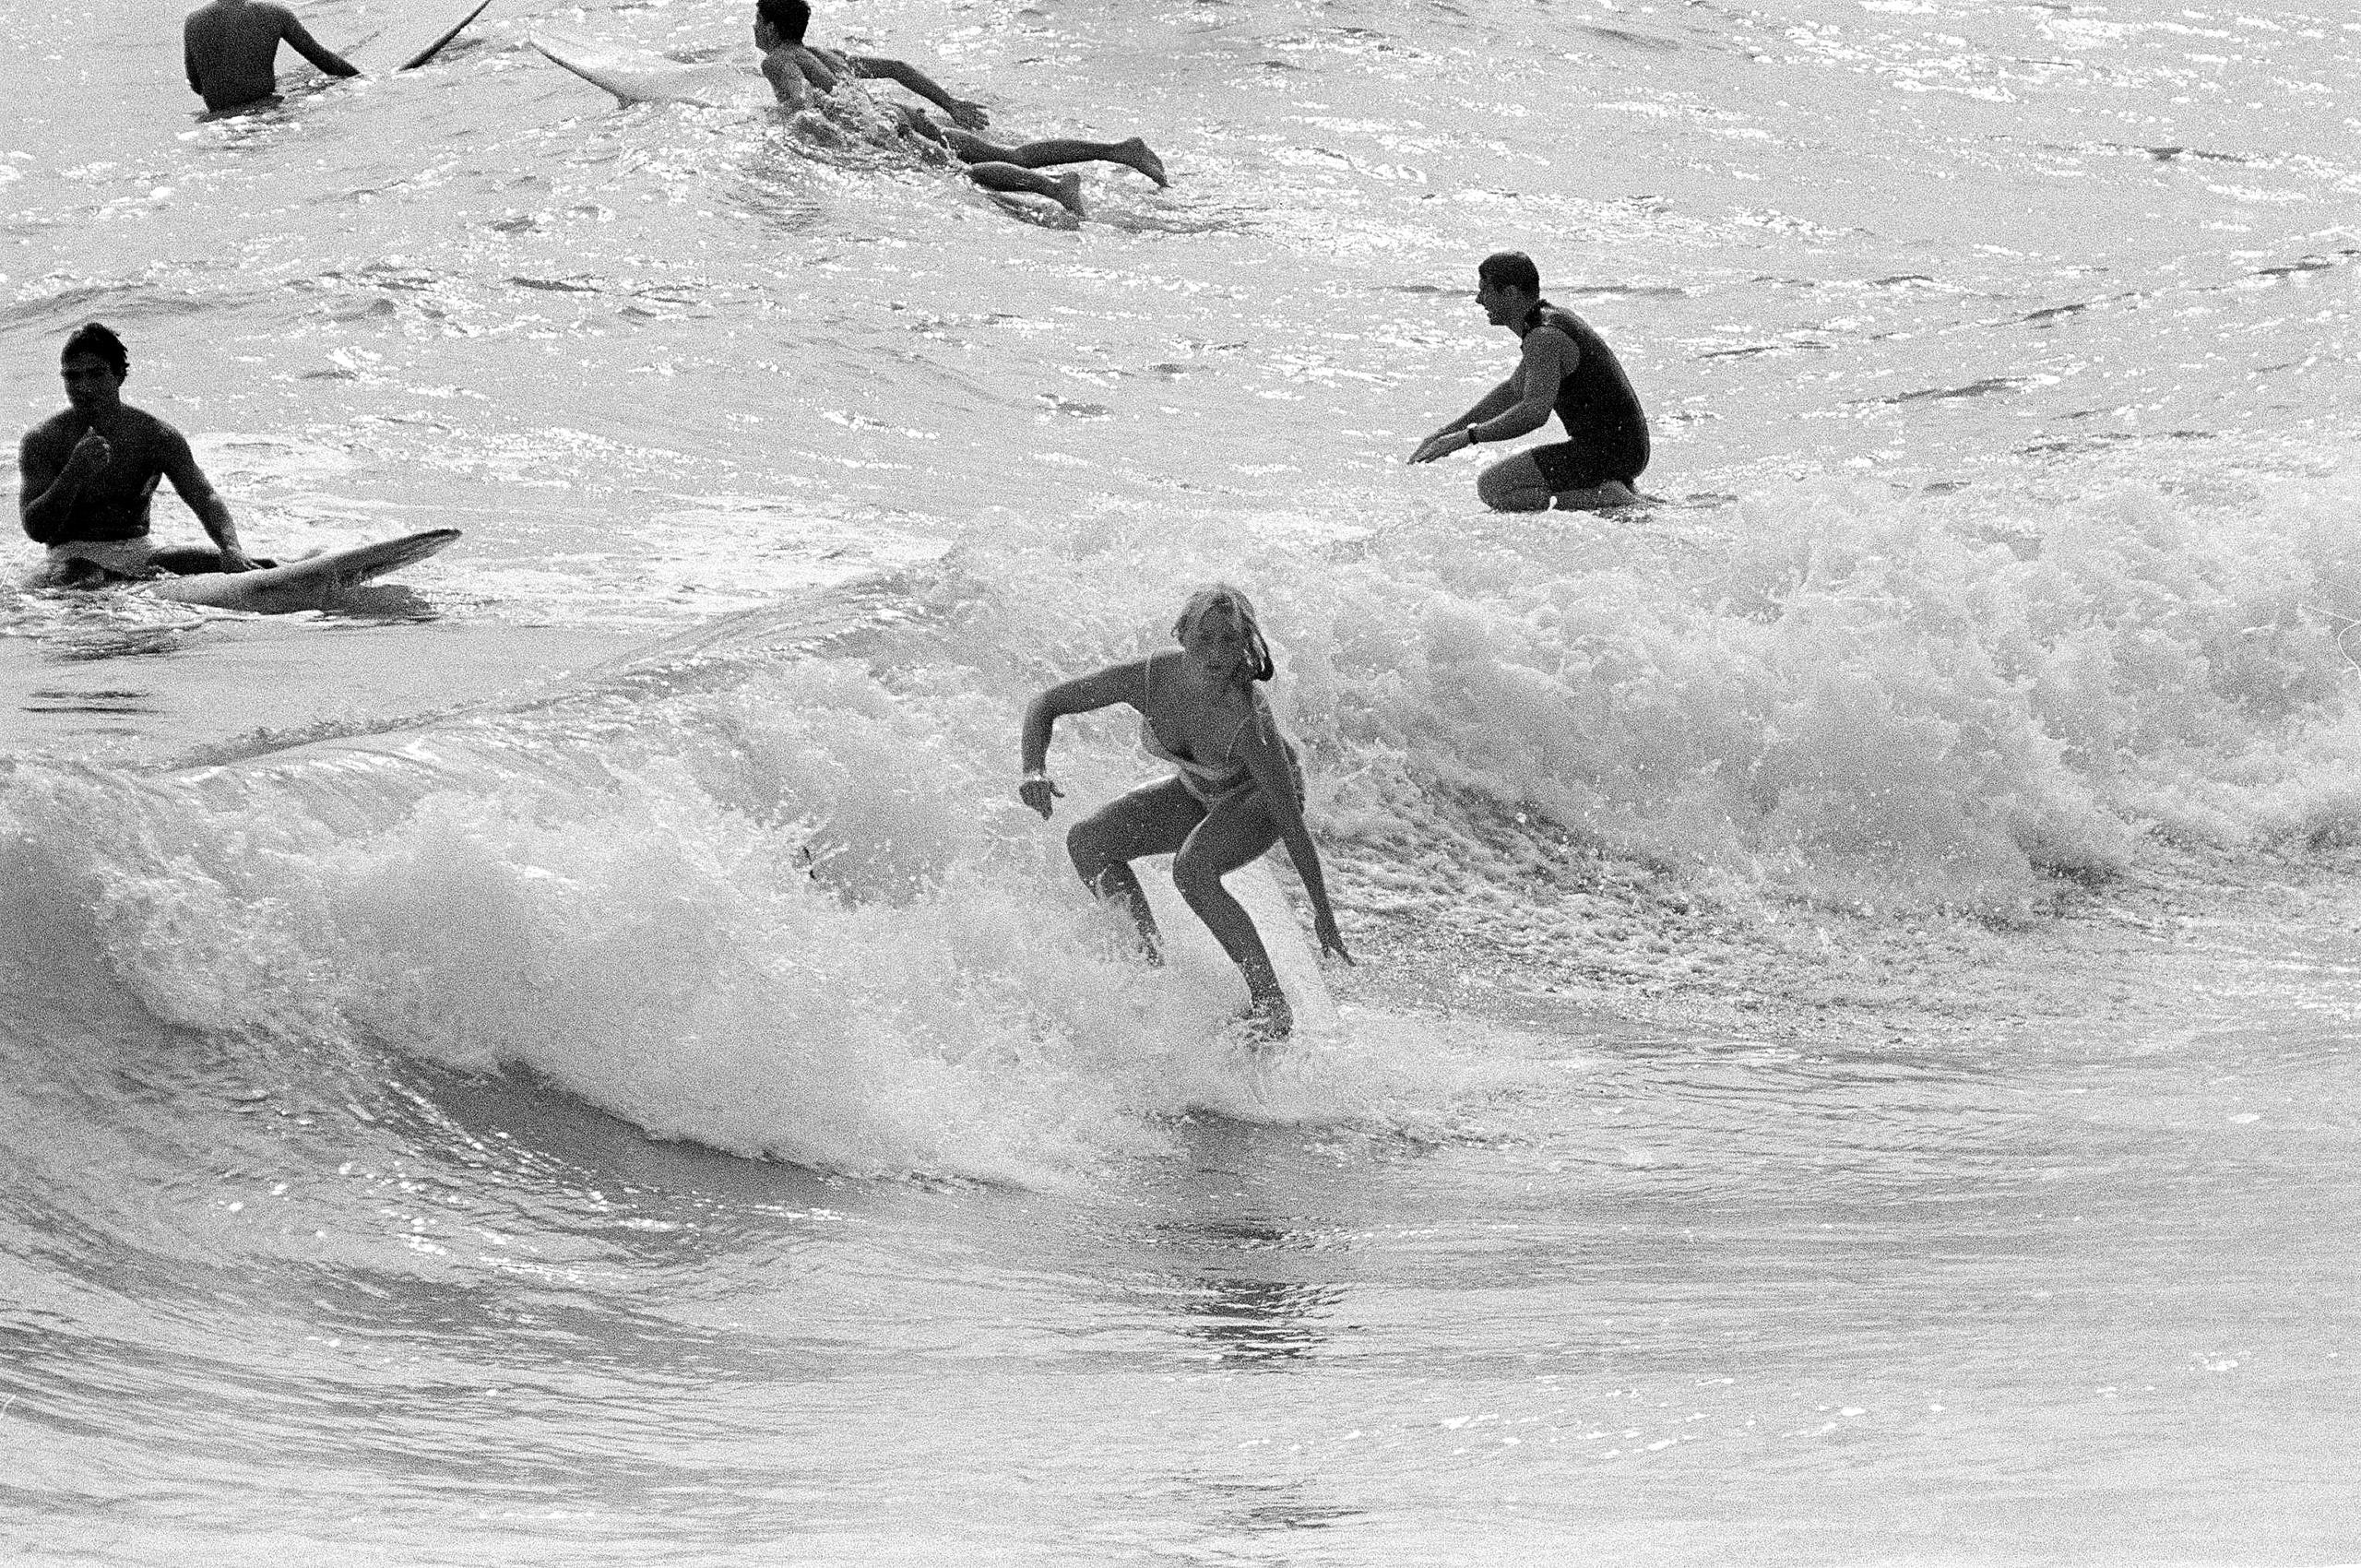 Surfers enjoying the warm waters of Miami Beach, Fla., 1966.